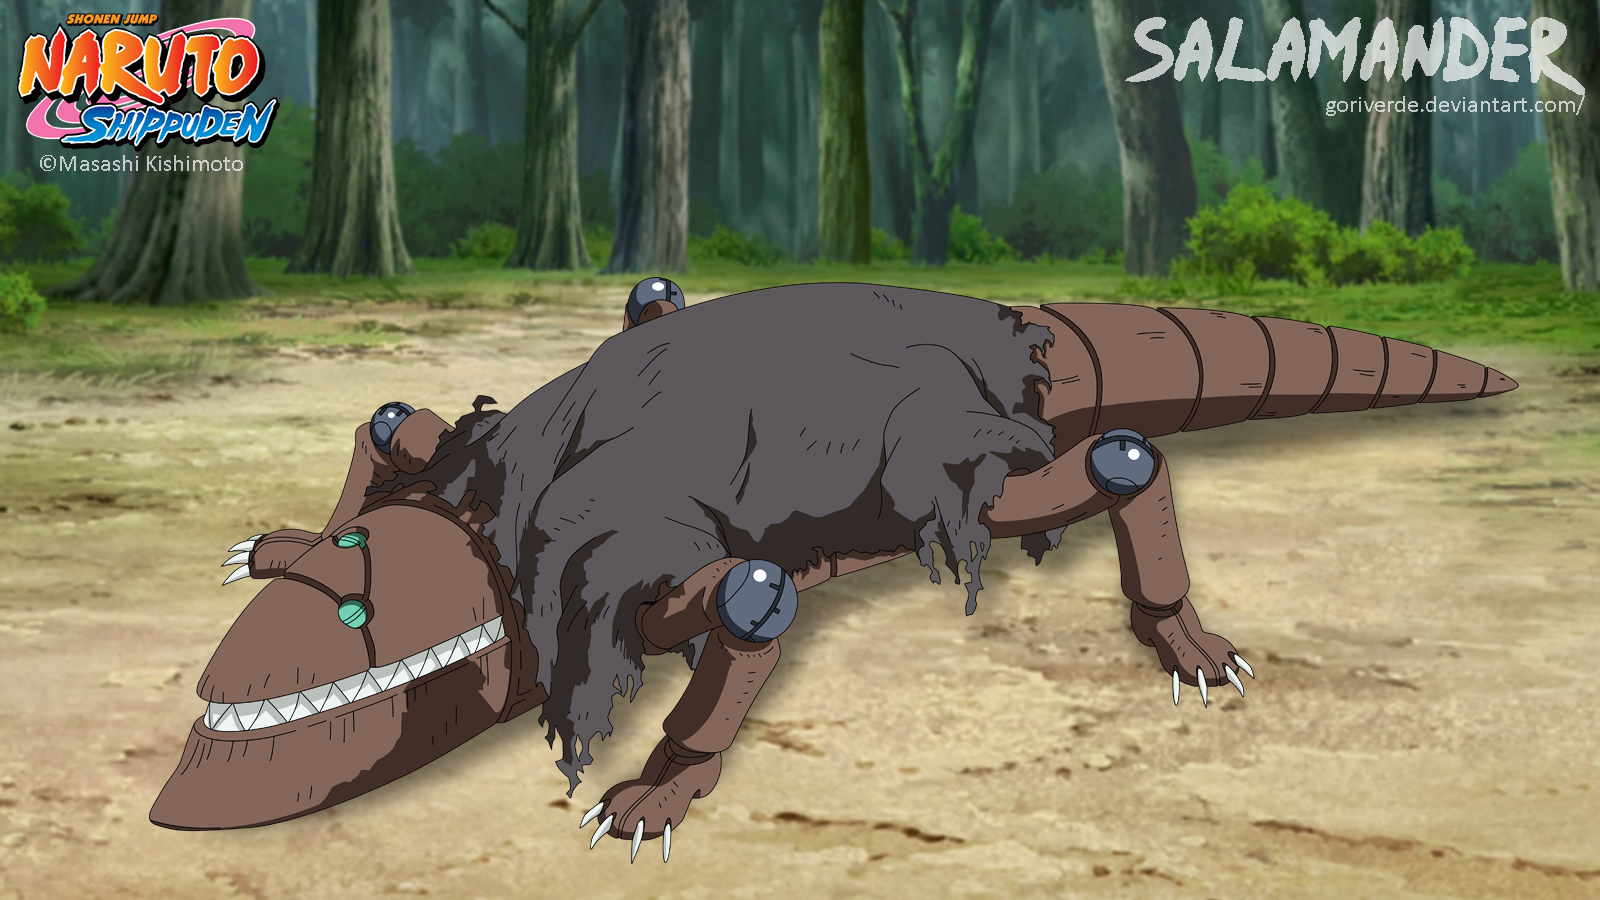 Salamander/ Sanshouo by goriverde